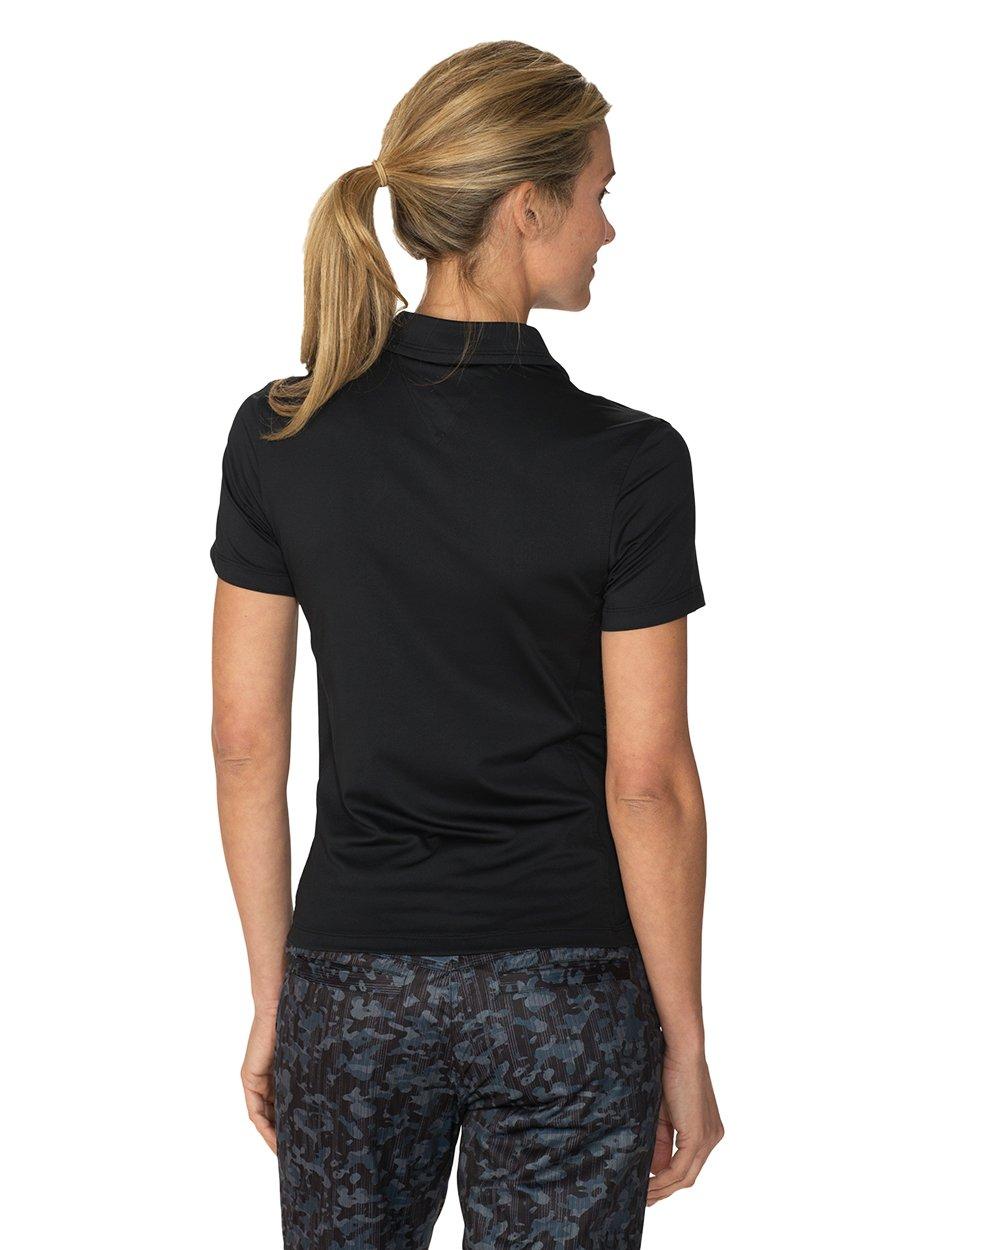 Chase54 Womens Leisure Short Sleeve Polo Shirt LE1100-P